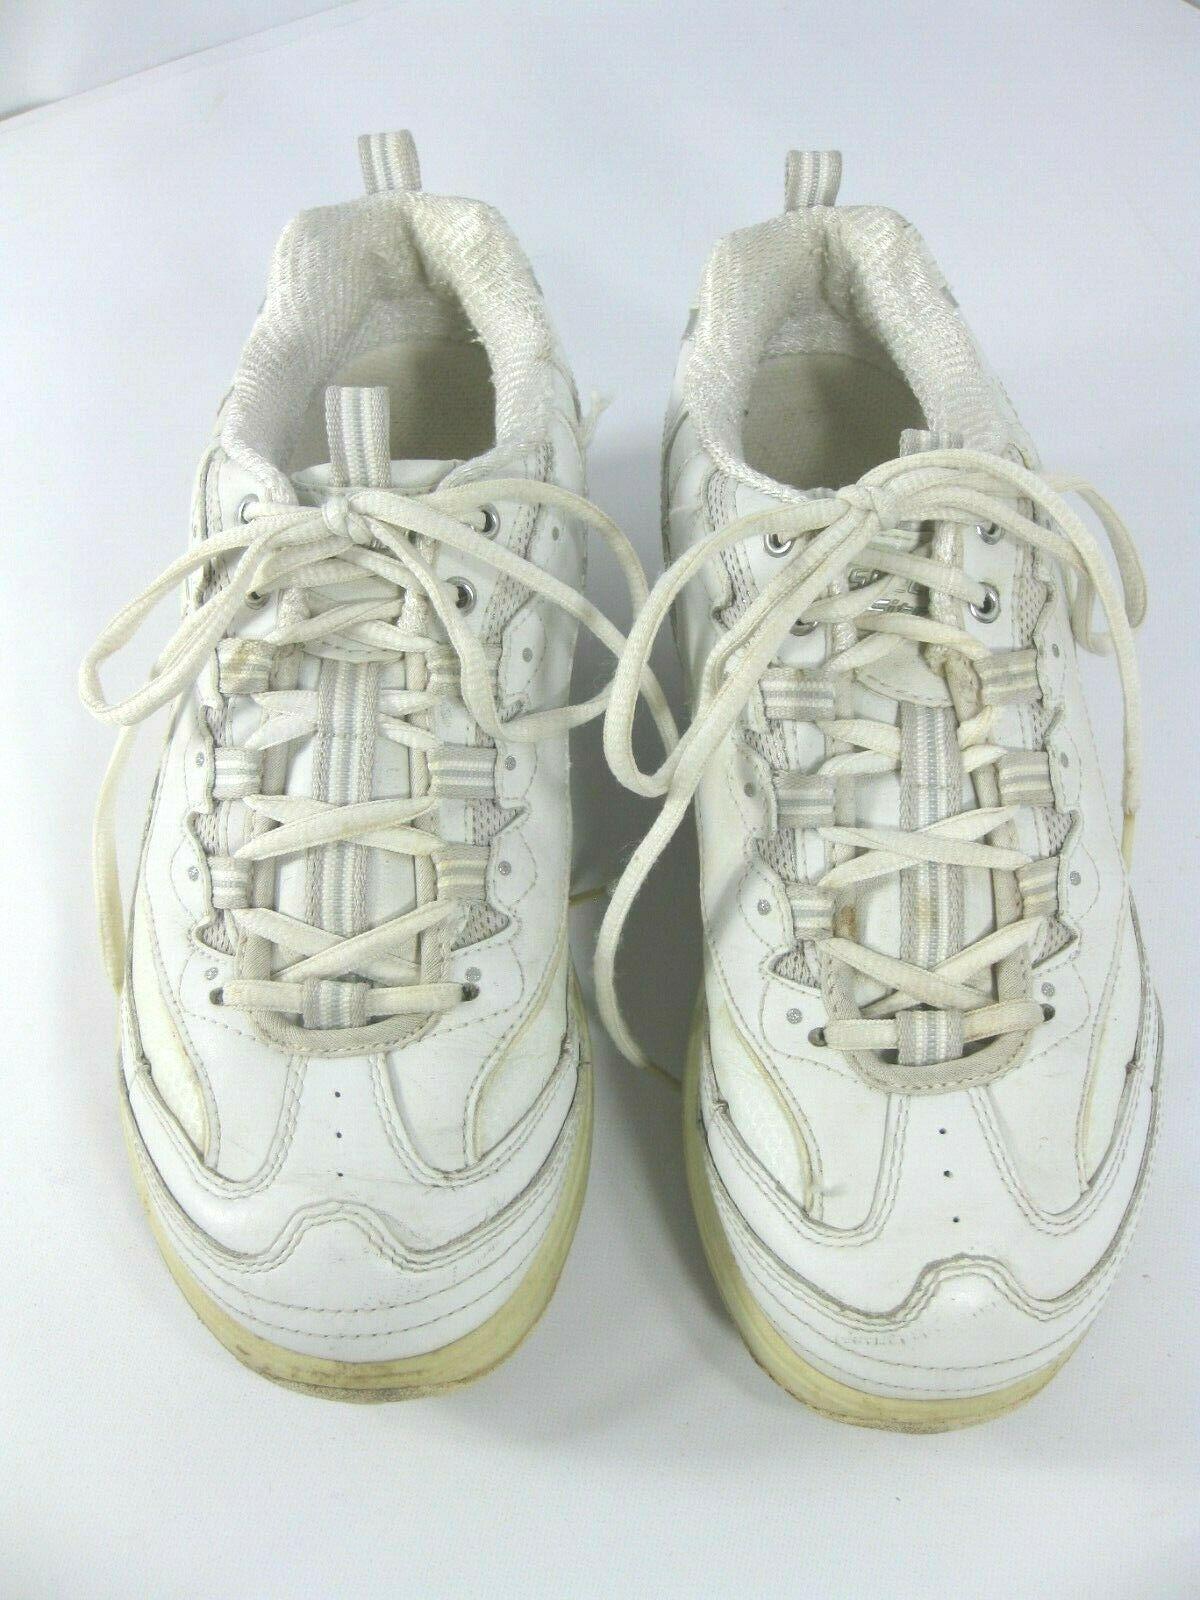 Sketcher Shape Ups Womens Size 8 White 11800 Fitness Sneaker Walking Shoes image 3